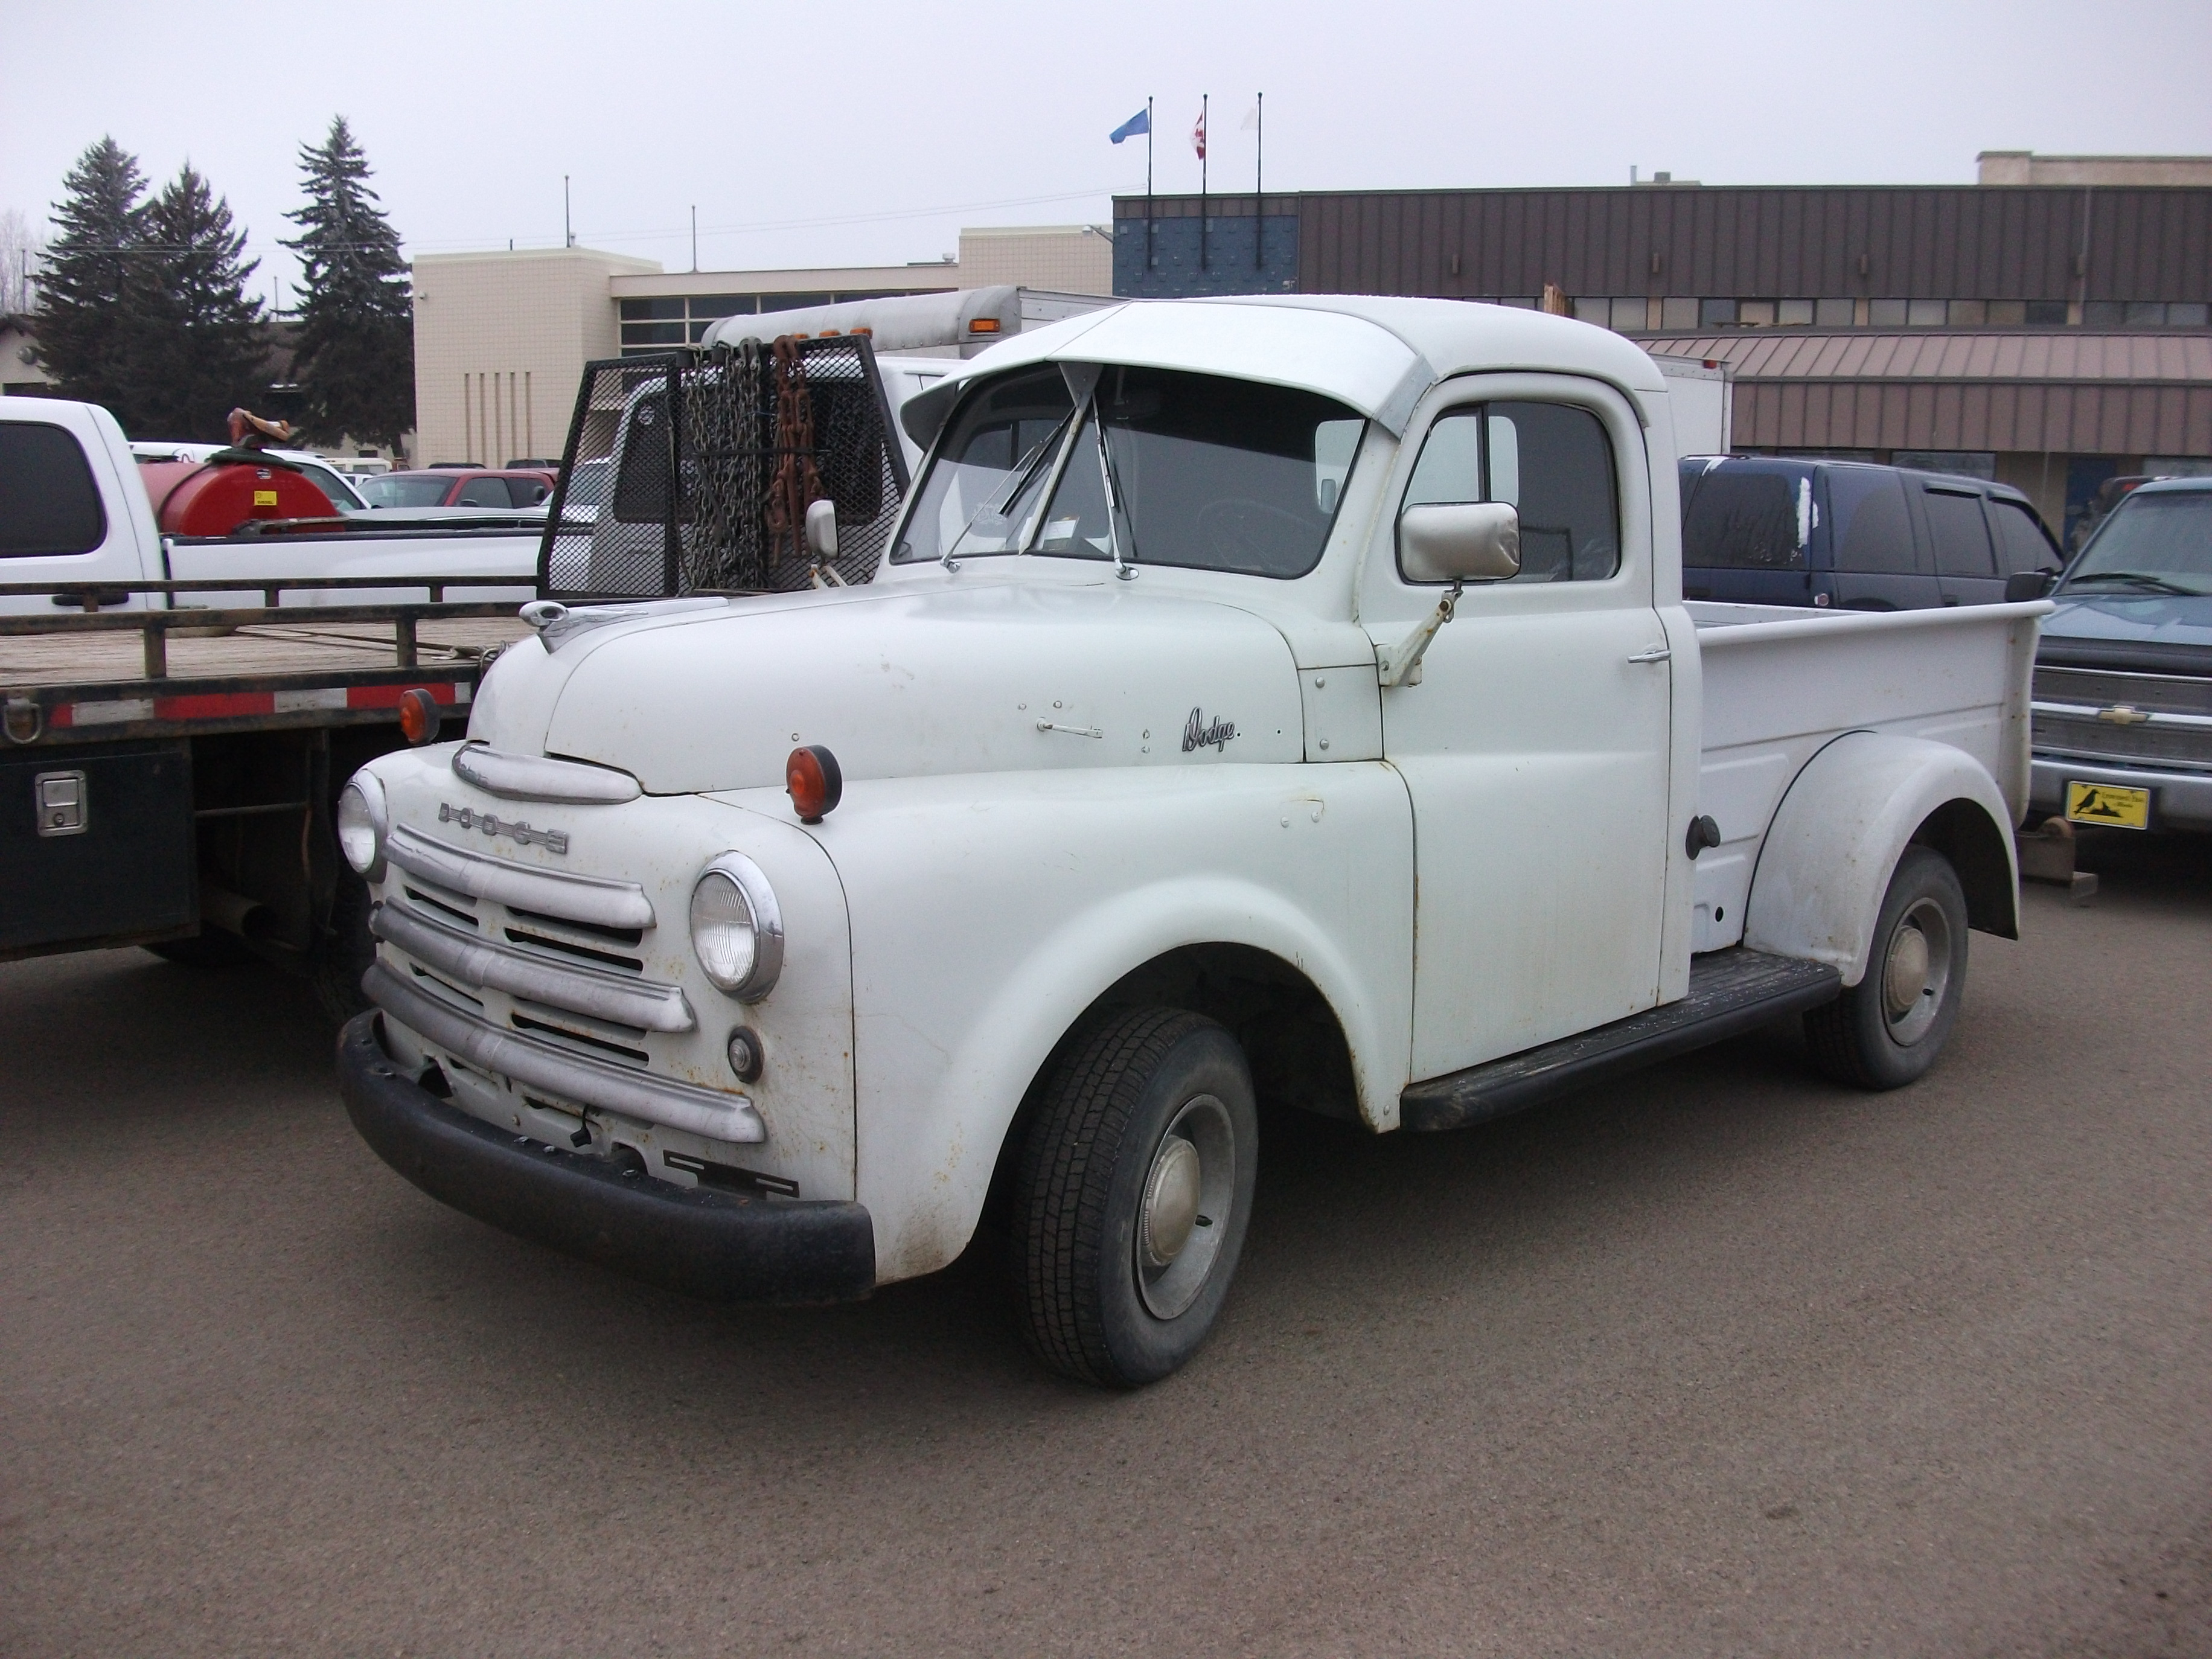 File:Dodge-truck.jpg - Wikimedia Commons